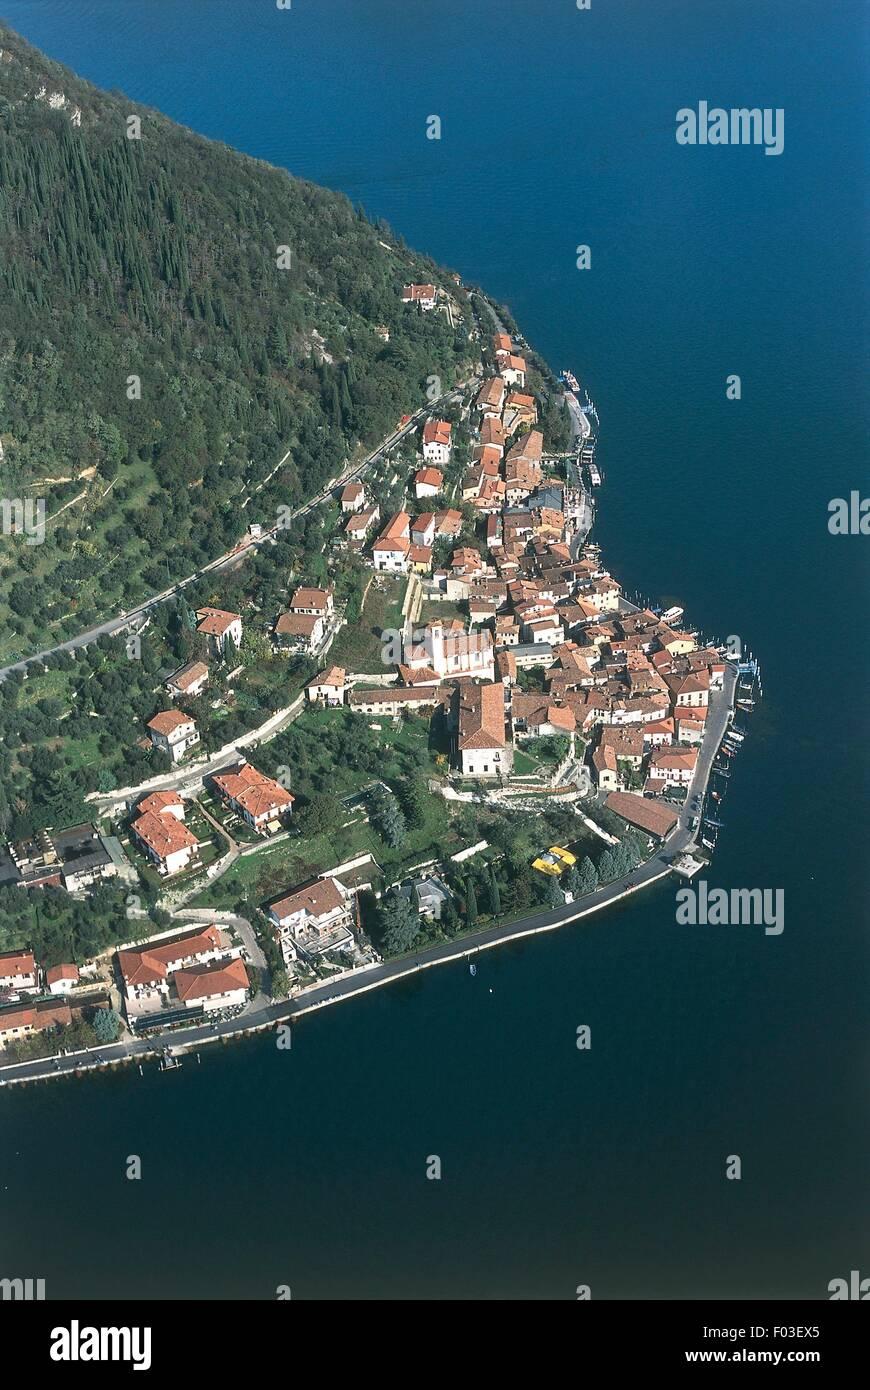 Aerial view of Peschiera Maraglio, Monte Isola, on Lake Iseo or Sebino - Province of Brescia, Lombardy Region, Italy - Stock Image